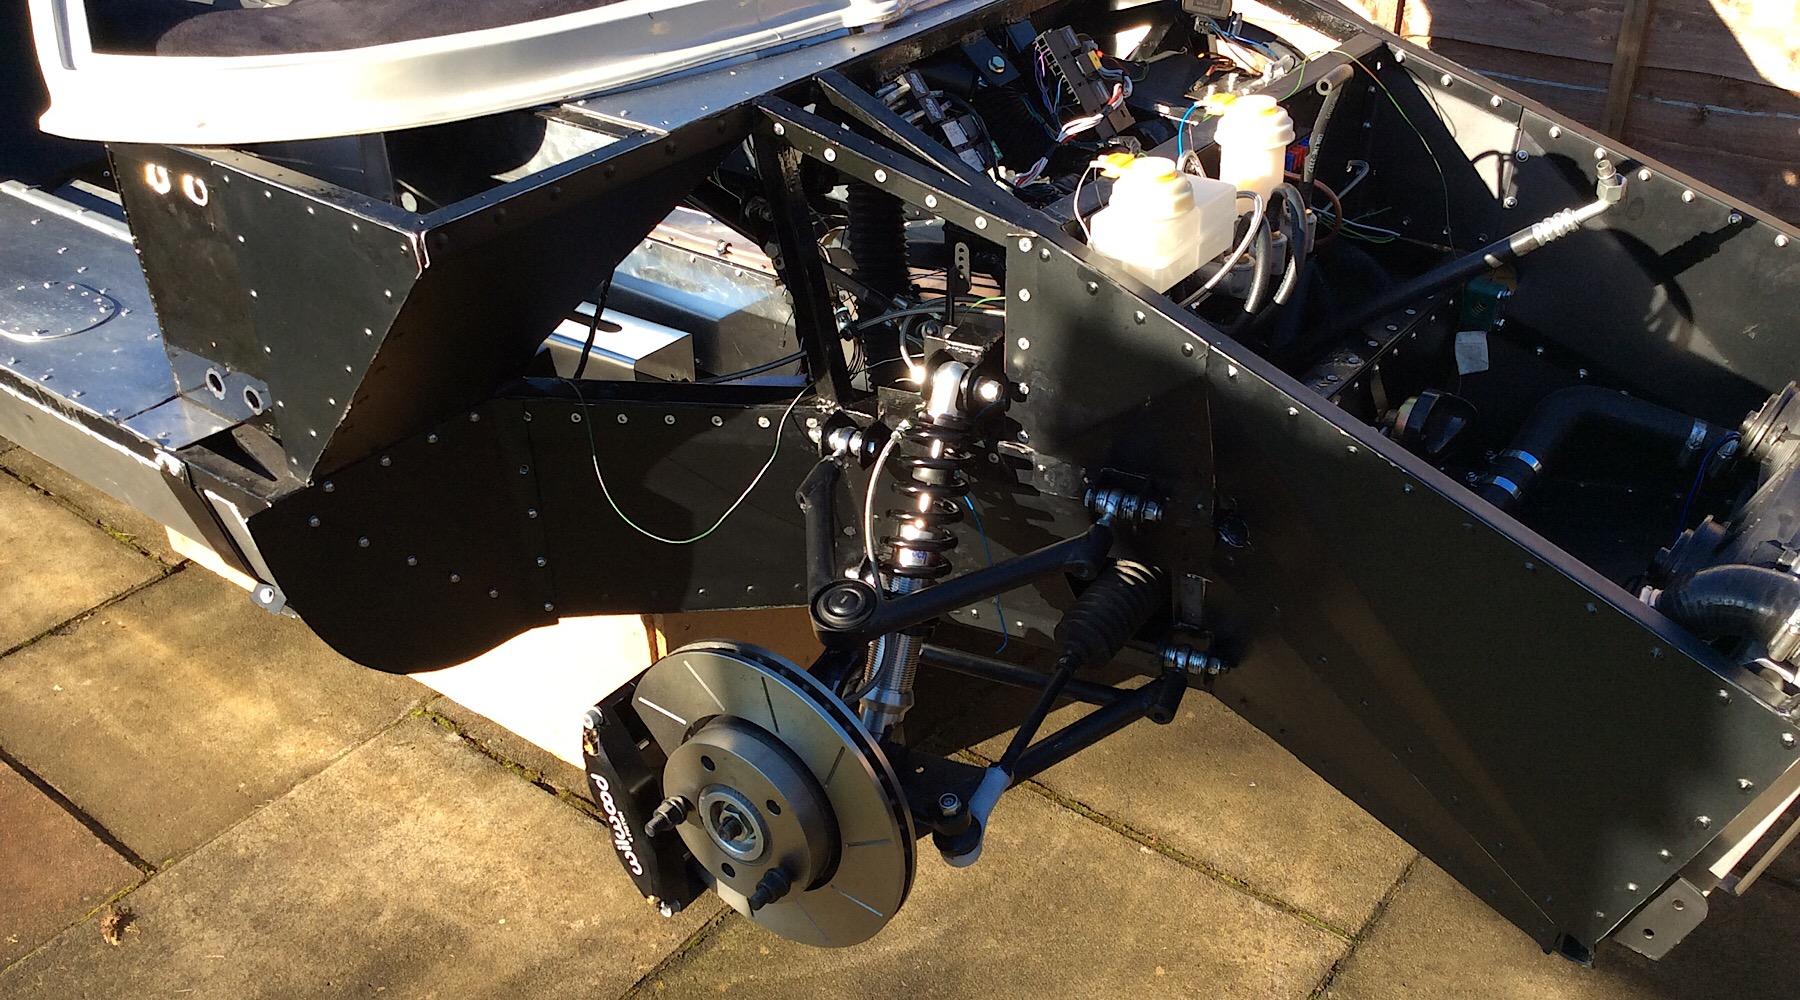 Bob's GT Forte scratch build.-6aafd0b4-0085-4b3c-acc7-583943cc5c9c-jpeg